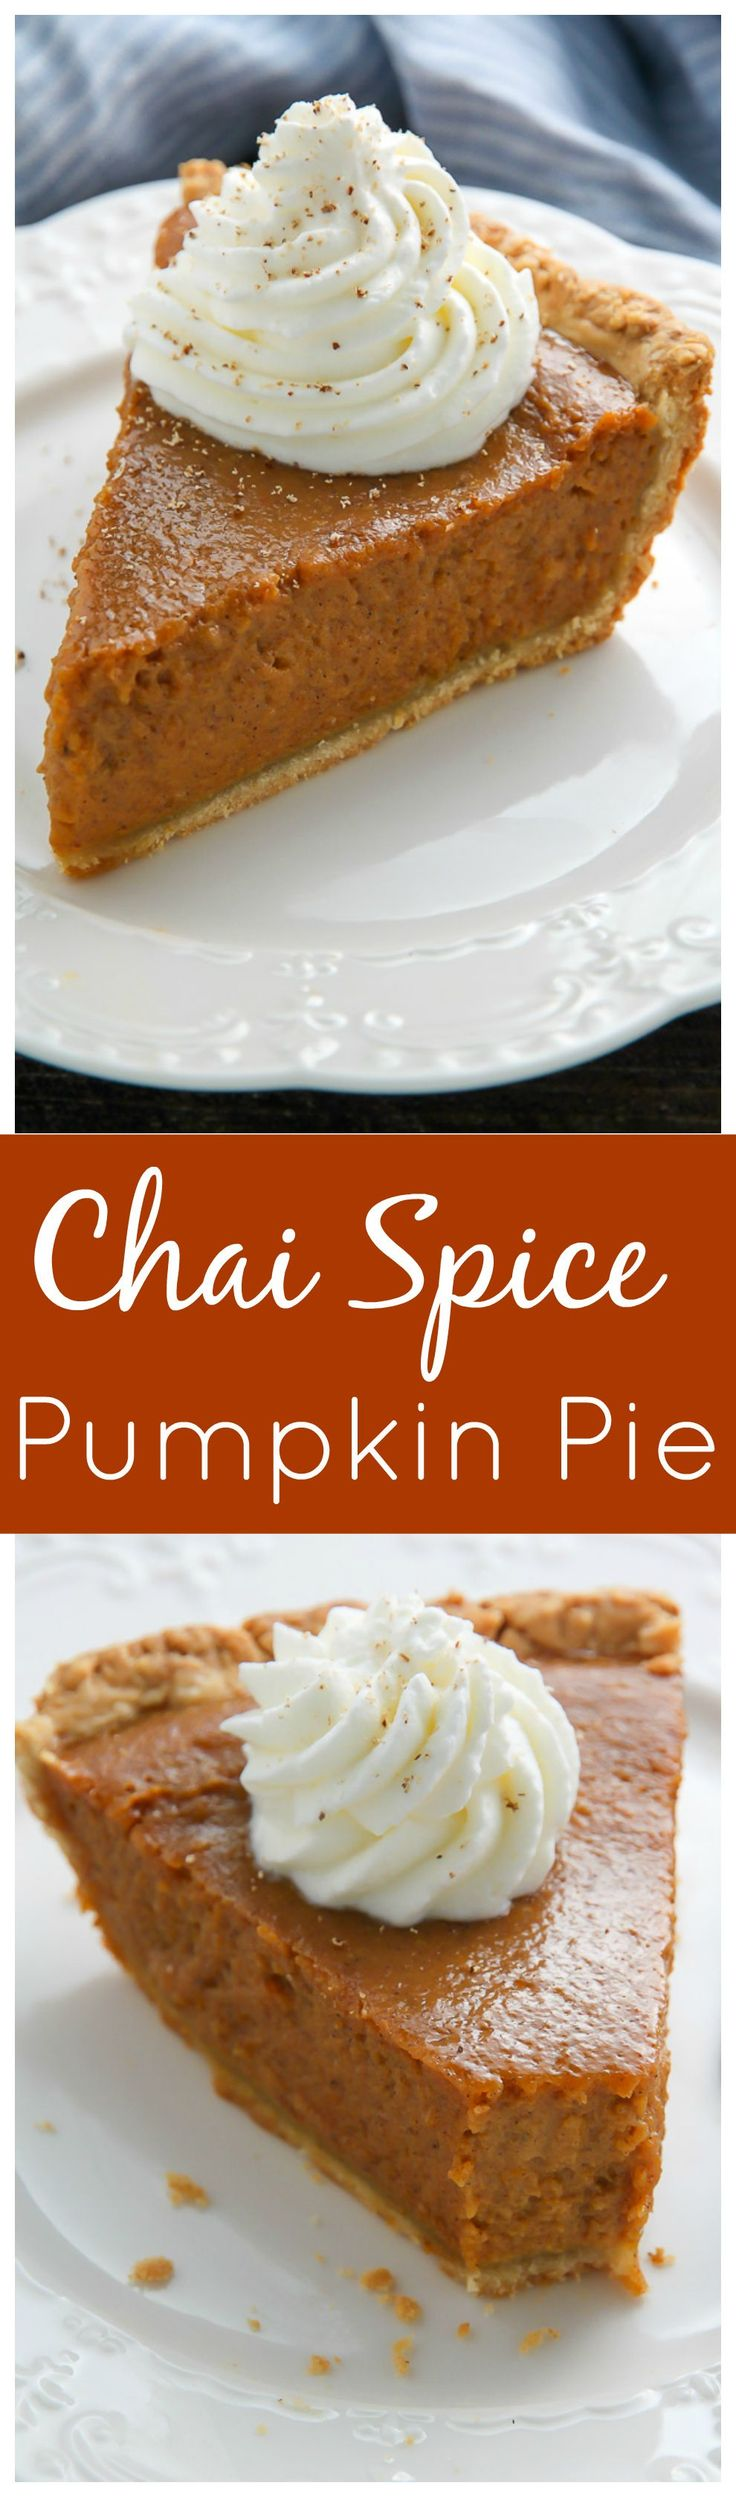 Chai Spice Pumpkin Pie - every bite is silky smooth!!!